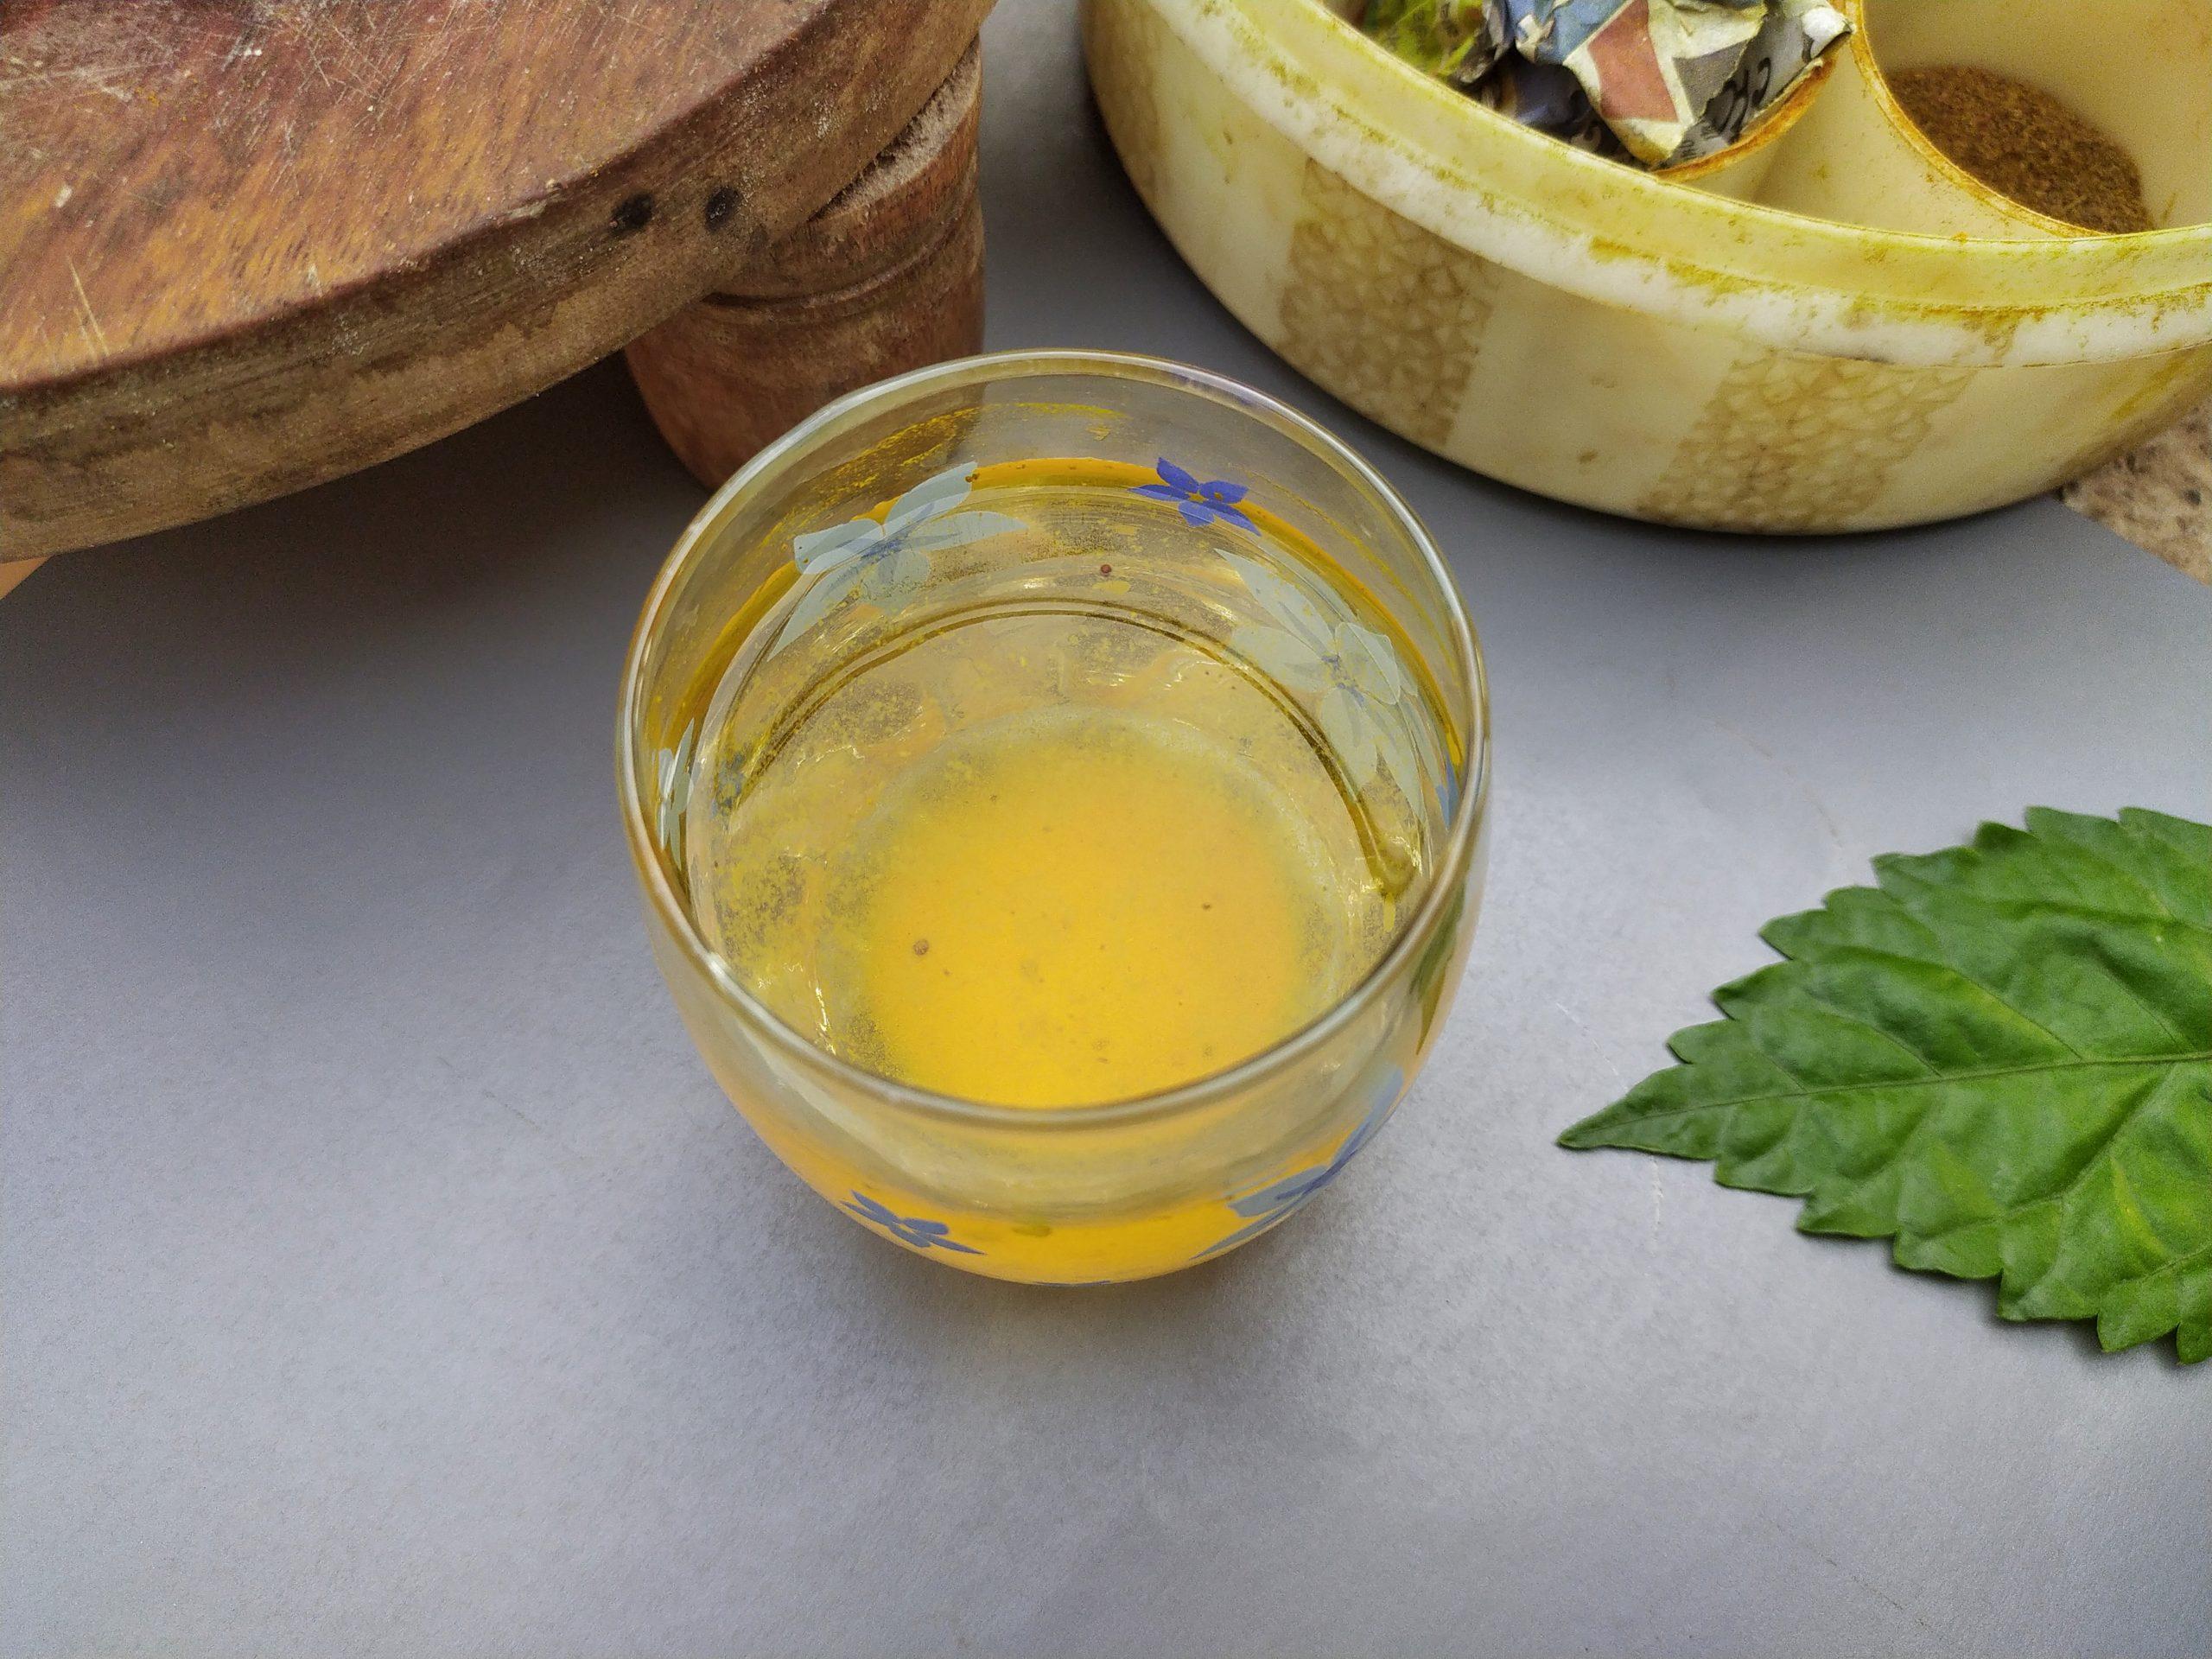 Fruit juice in a glass